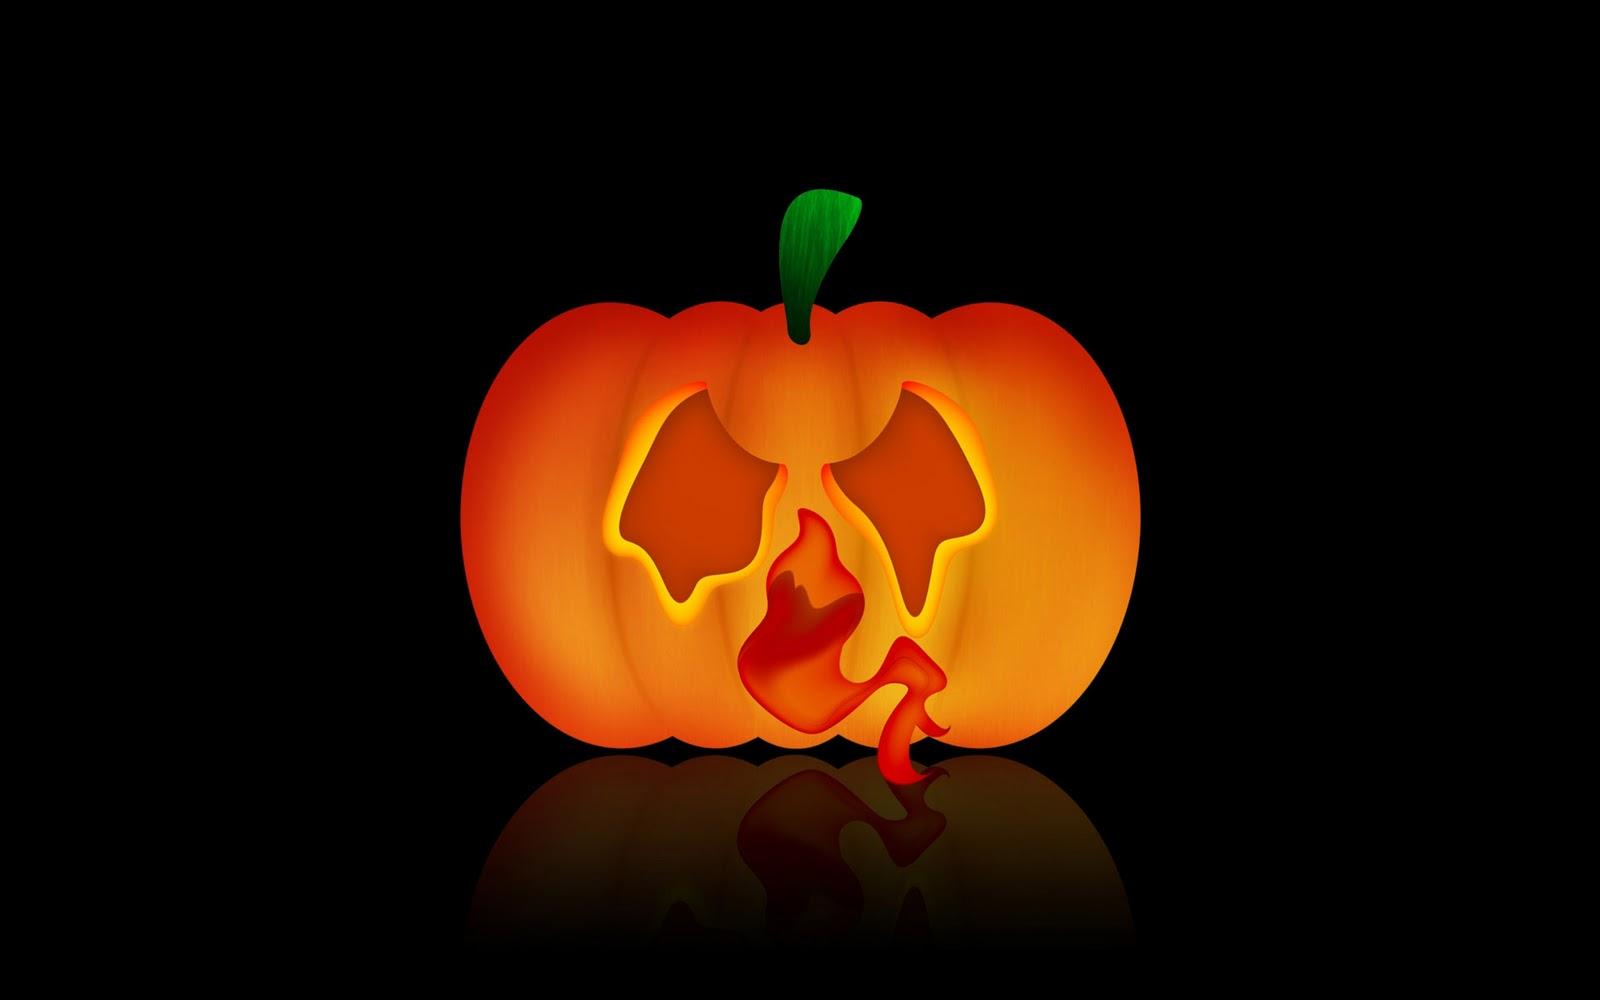 Popular Wallpaper Halloween Facebook - ghostly-pumpkin-wallpaper-for-halloween  2018_543580.jpg